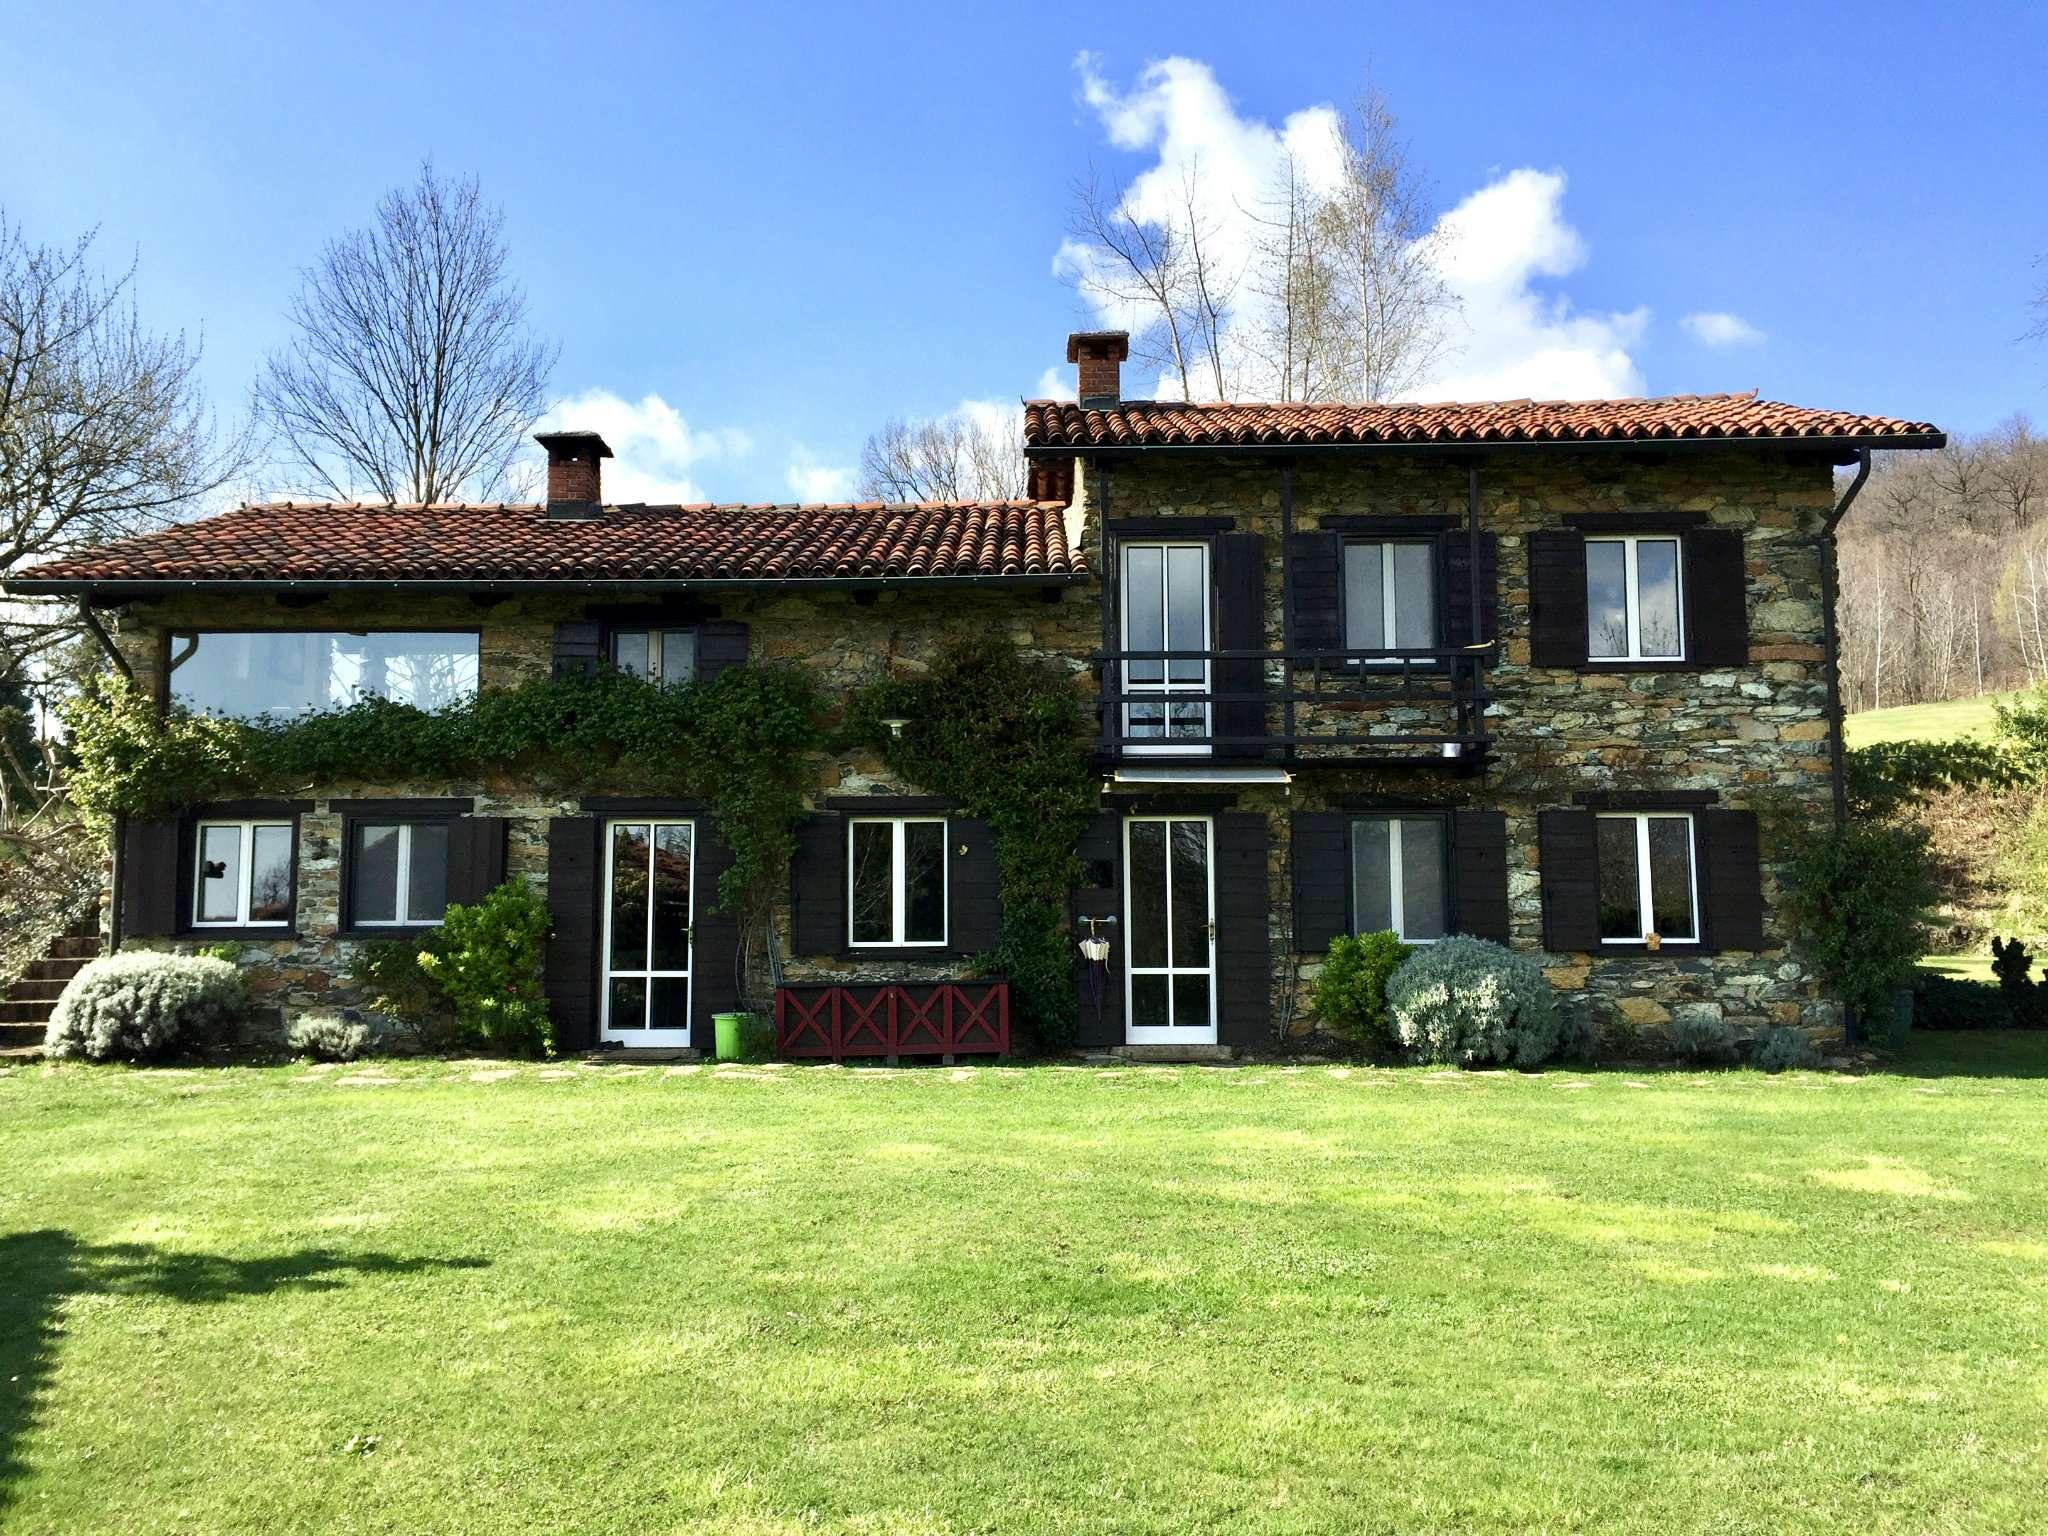 Villa in Vendita a Balangero